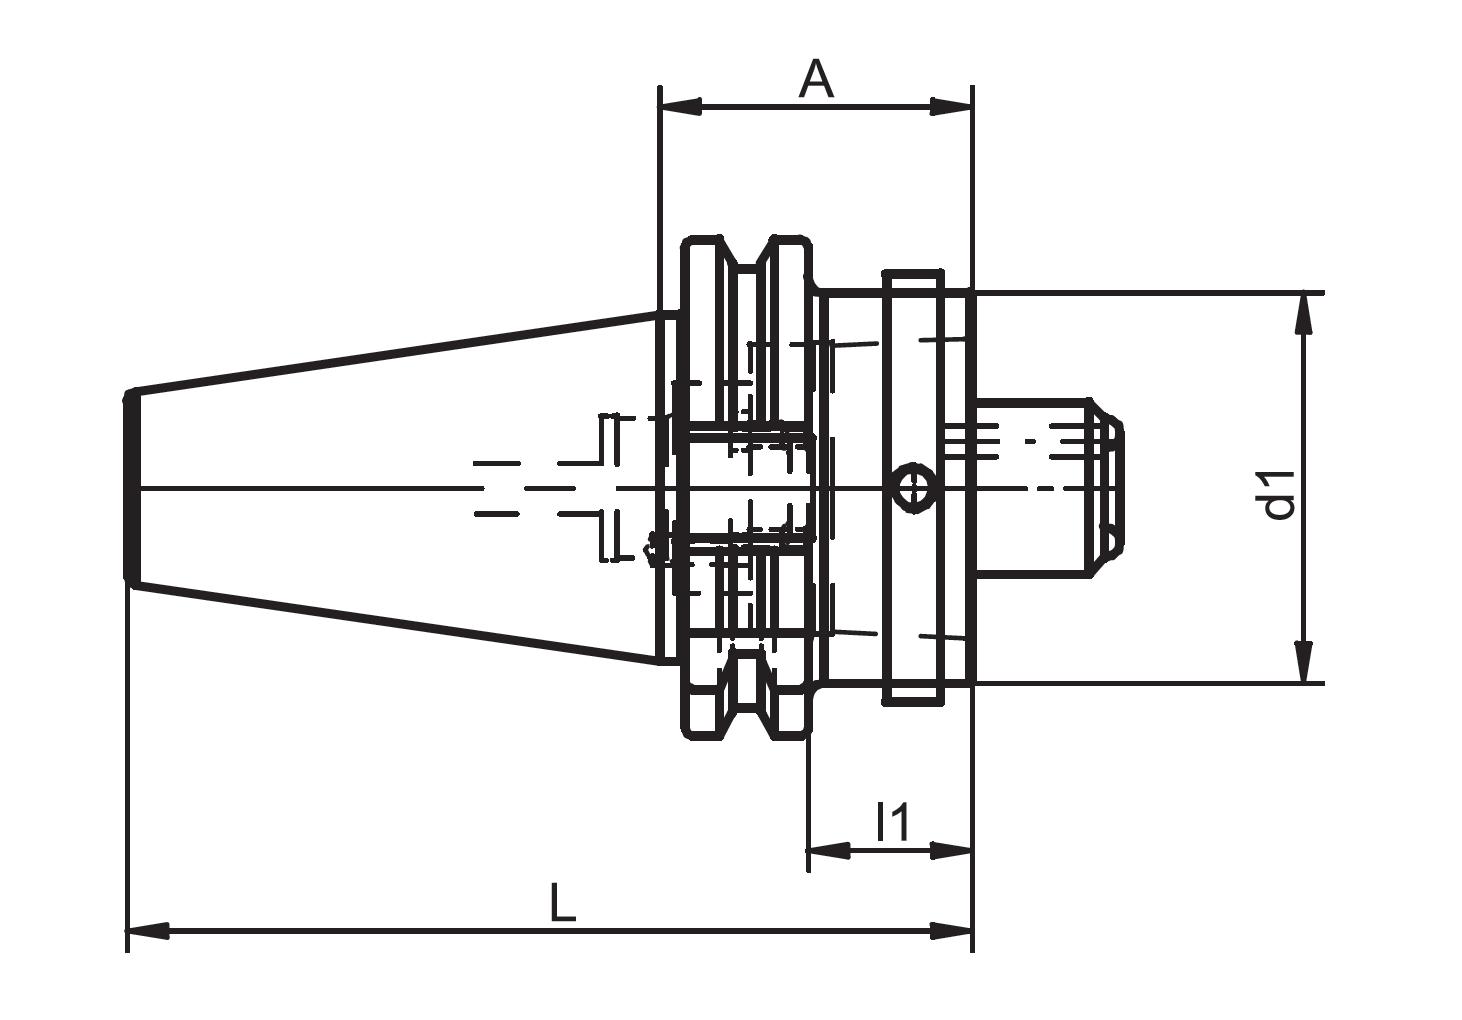 Steep Taper (MAS 403 BT) 40 (MAS 403 BT) to HSK Adapters